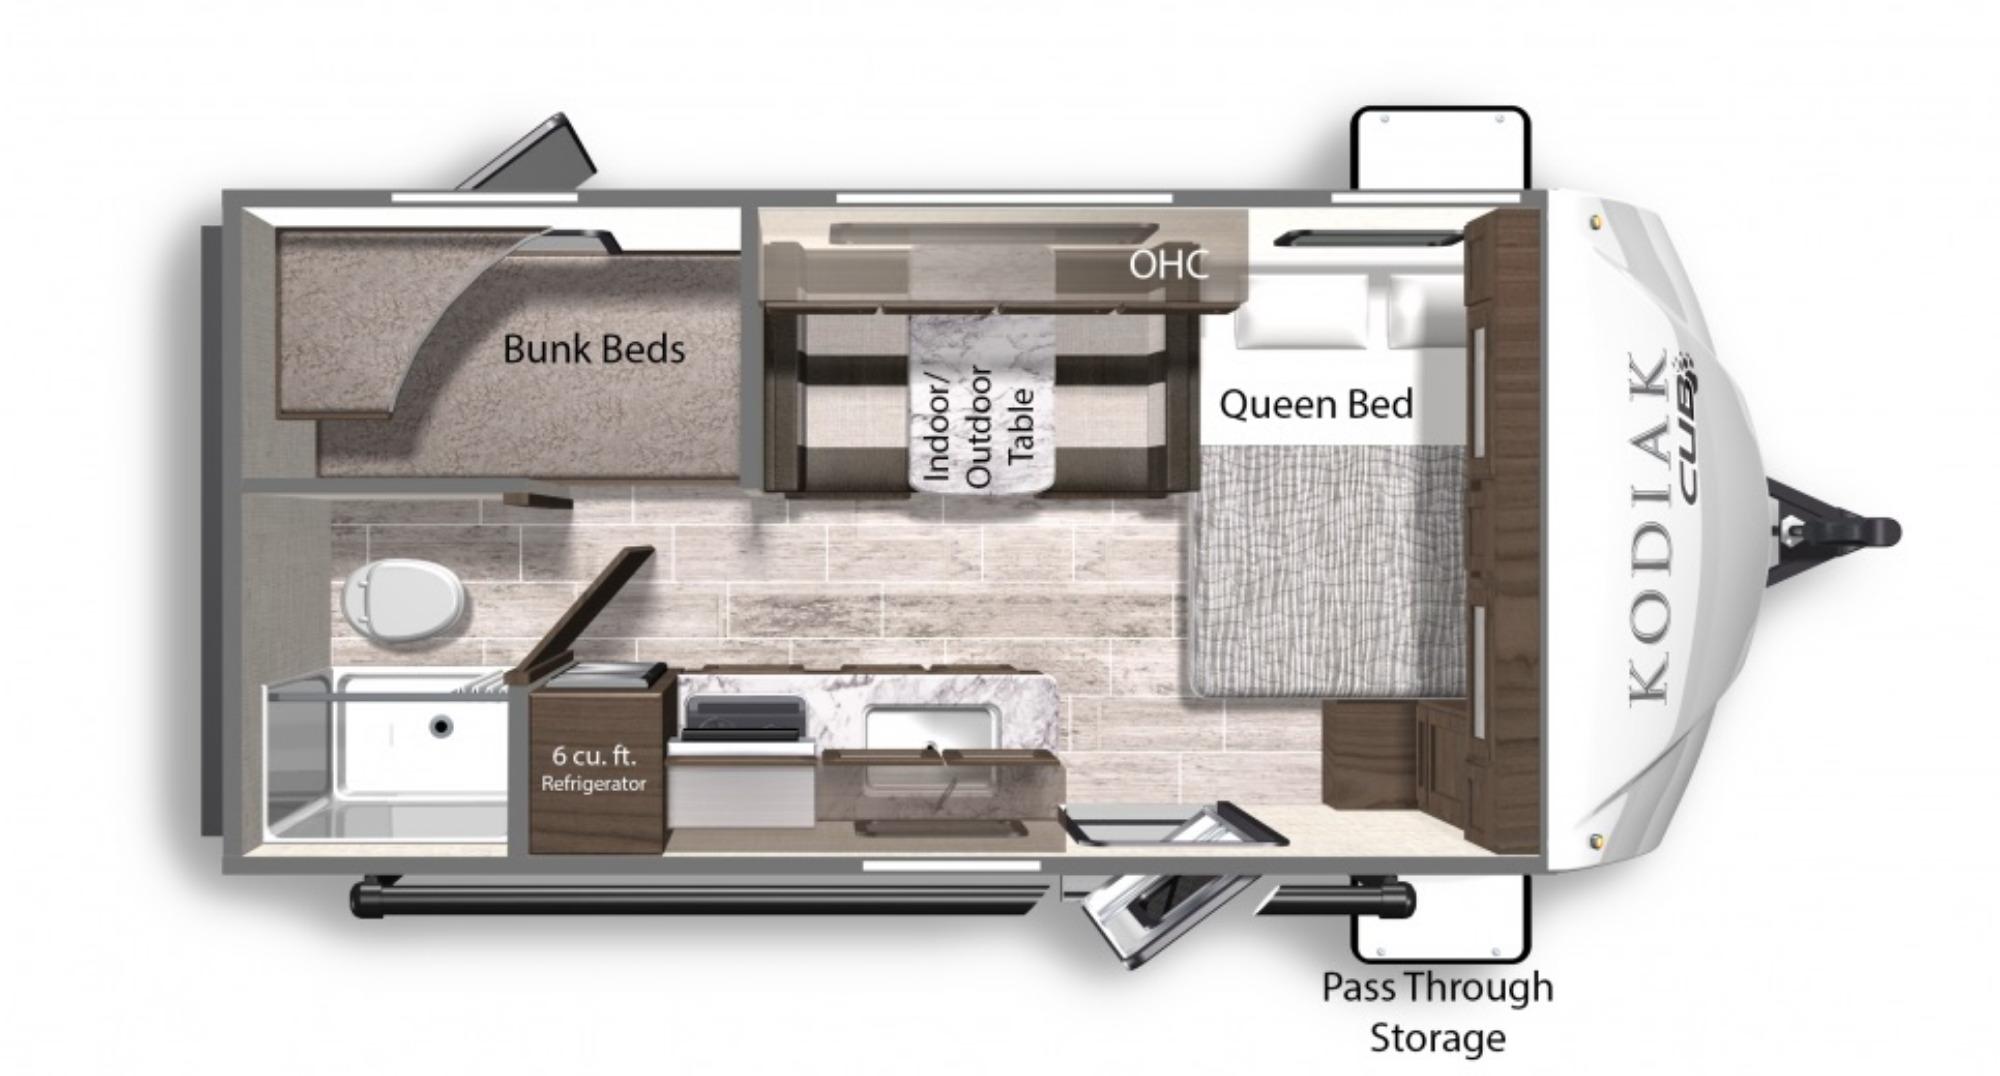 View Floor Plan for 2021 DUTCHMEN KODIAK CUB 175BH